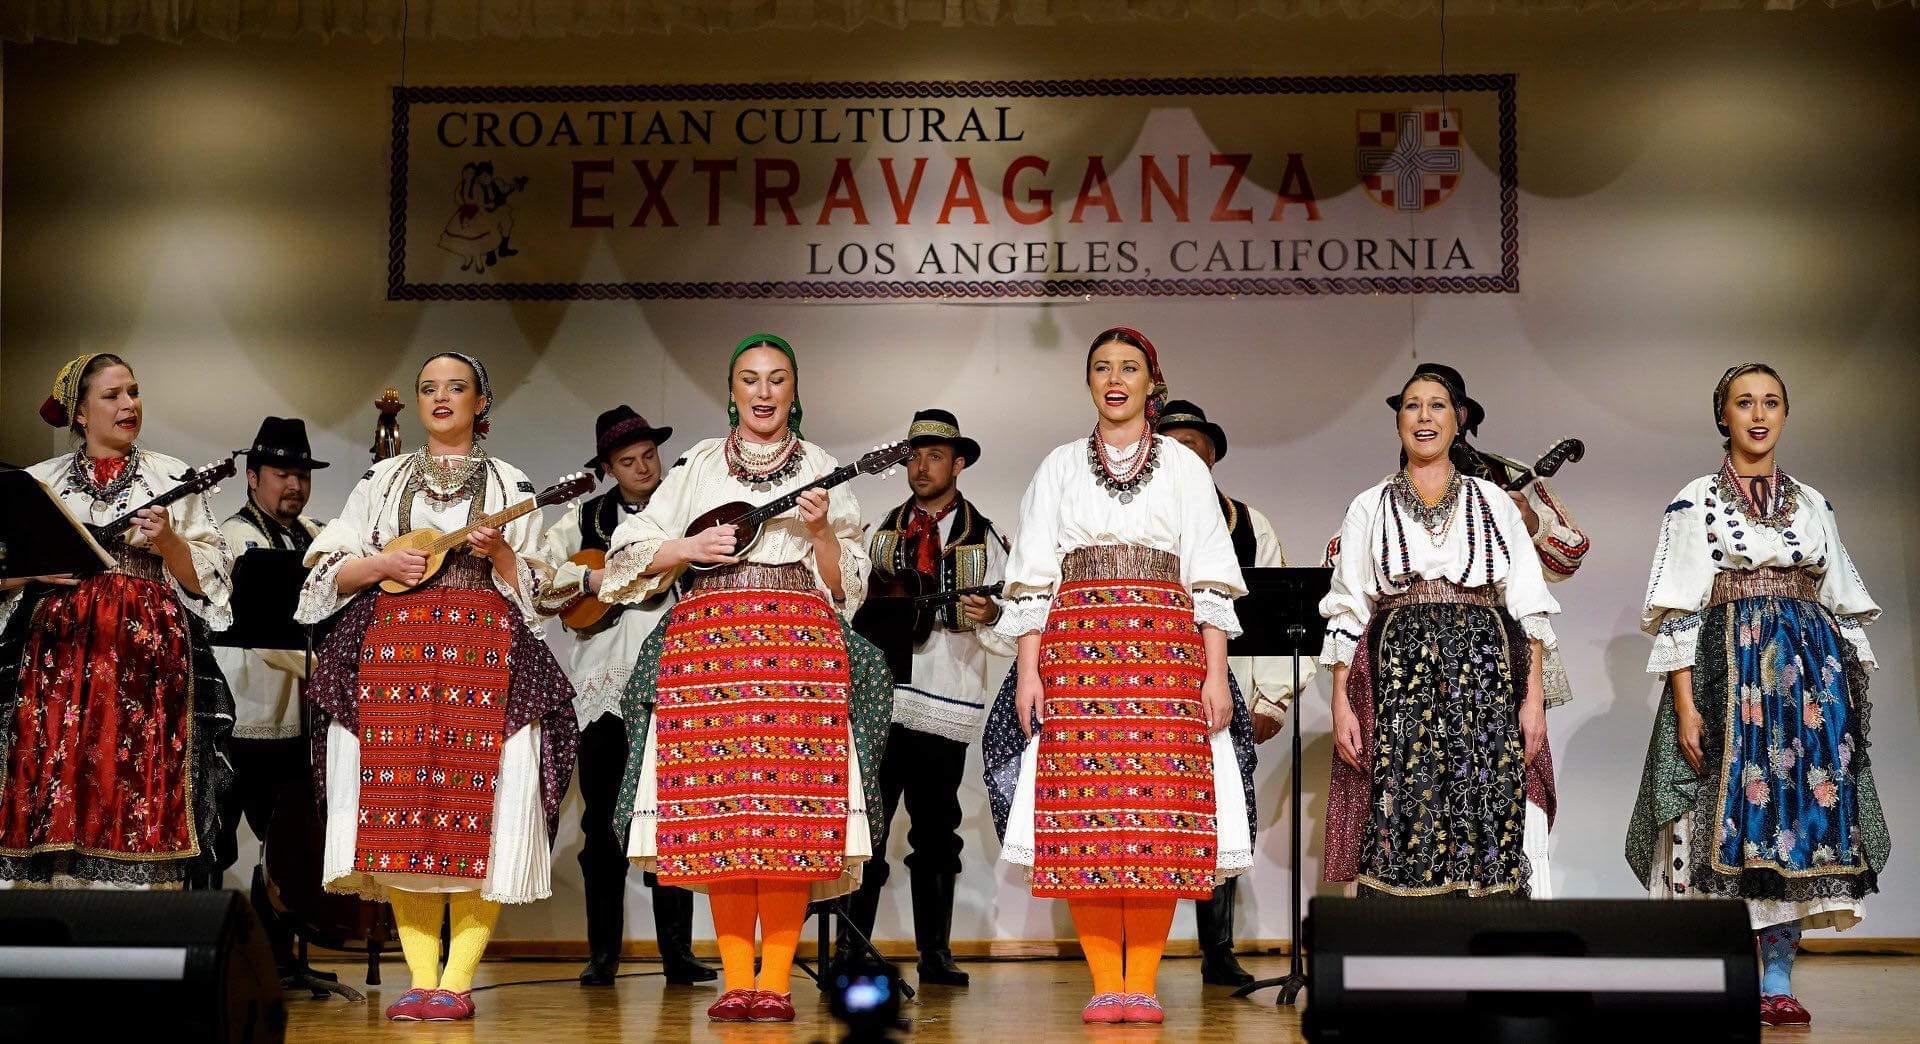 West Sacramento Ca >> 12th Annual Croatian Cultural Extravaganza in Los Angeles a Success | Croatia Week